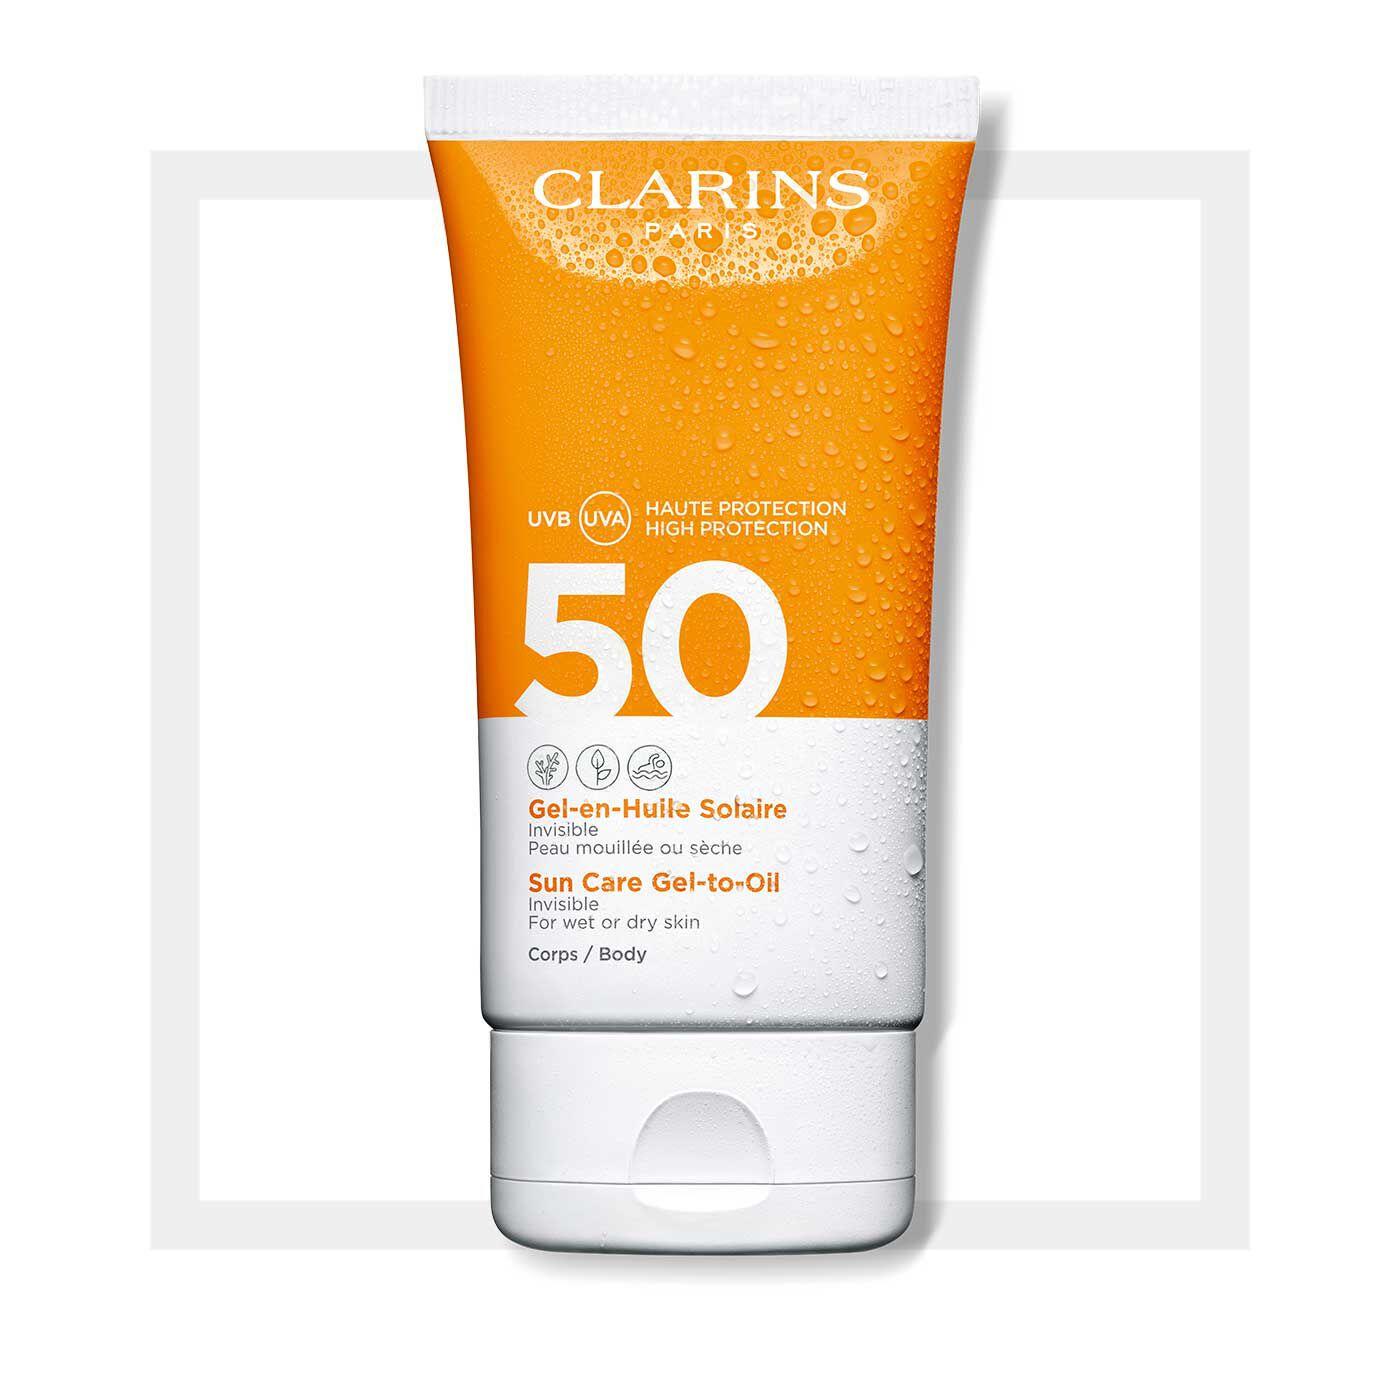 High Performance Sun Care SUN CARE BODY GEL-TO-OIL SPF50